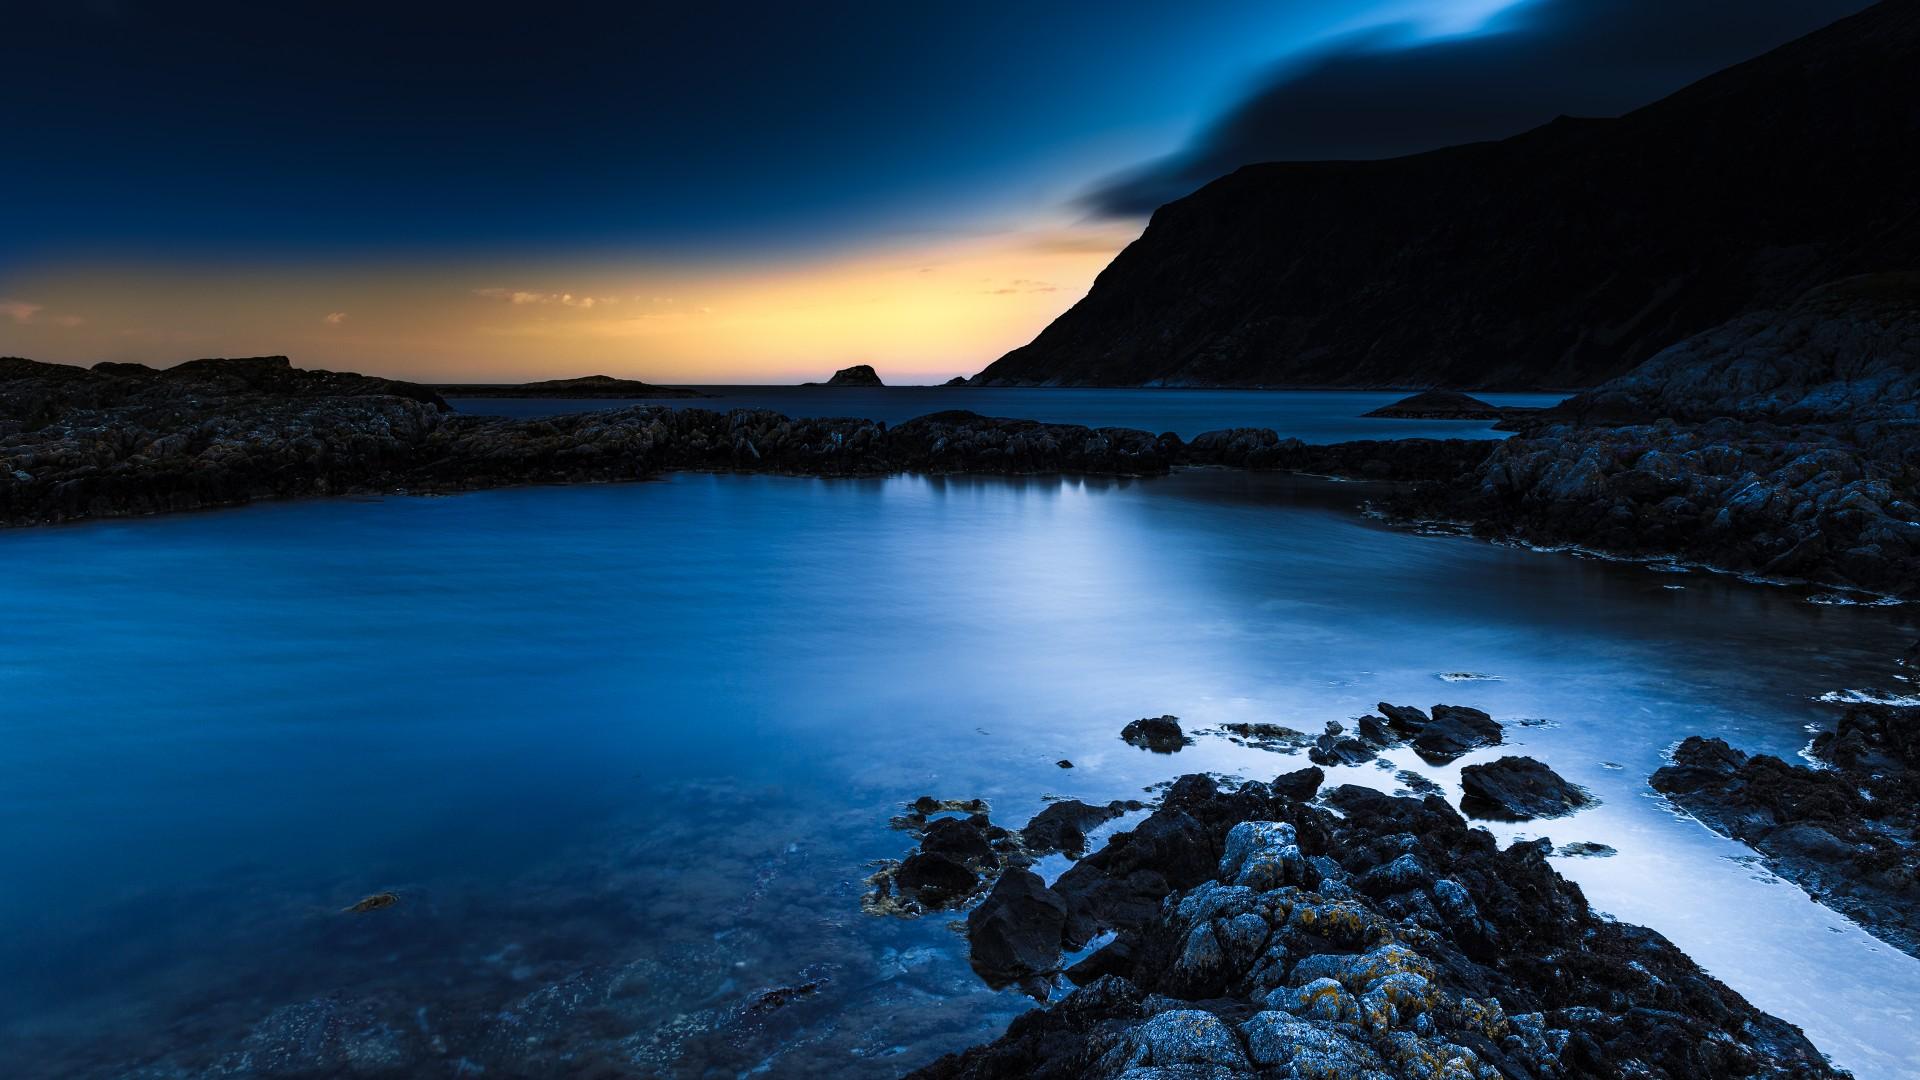 Wallpaper norway 4k hd wallpaper blue sunset sea for Sfondi 4k per pc